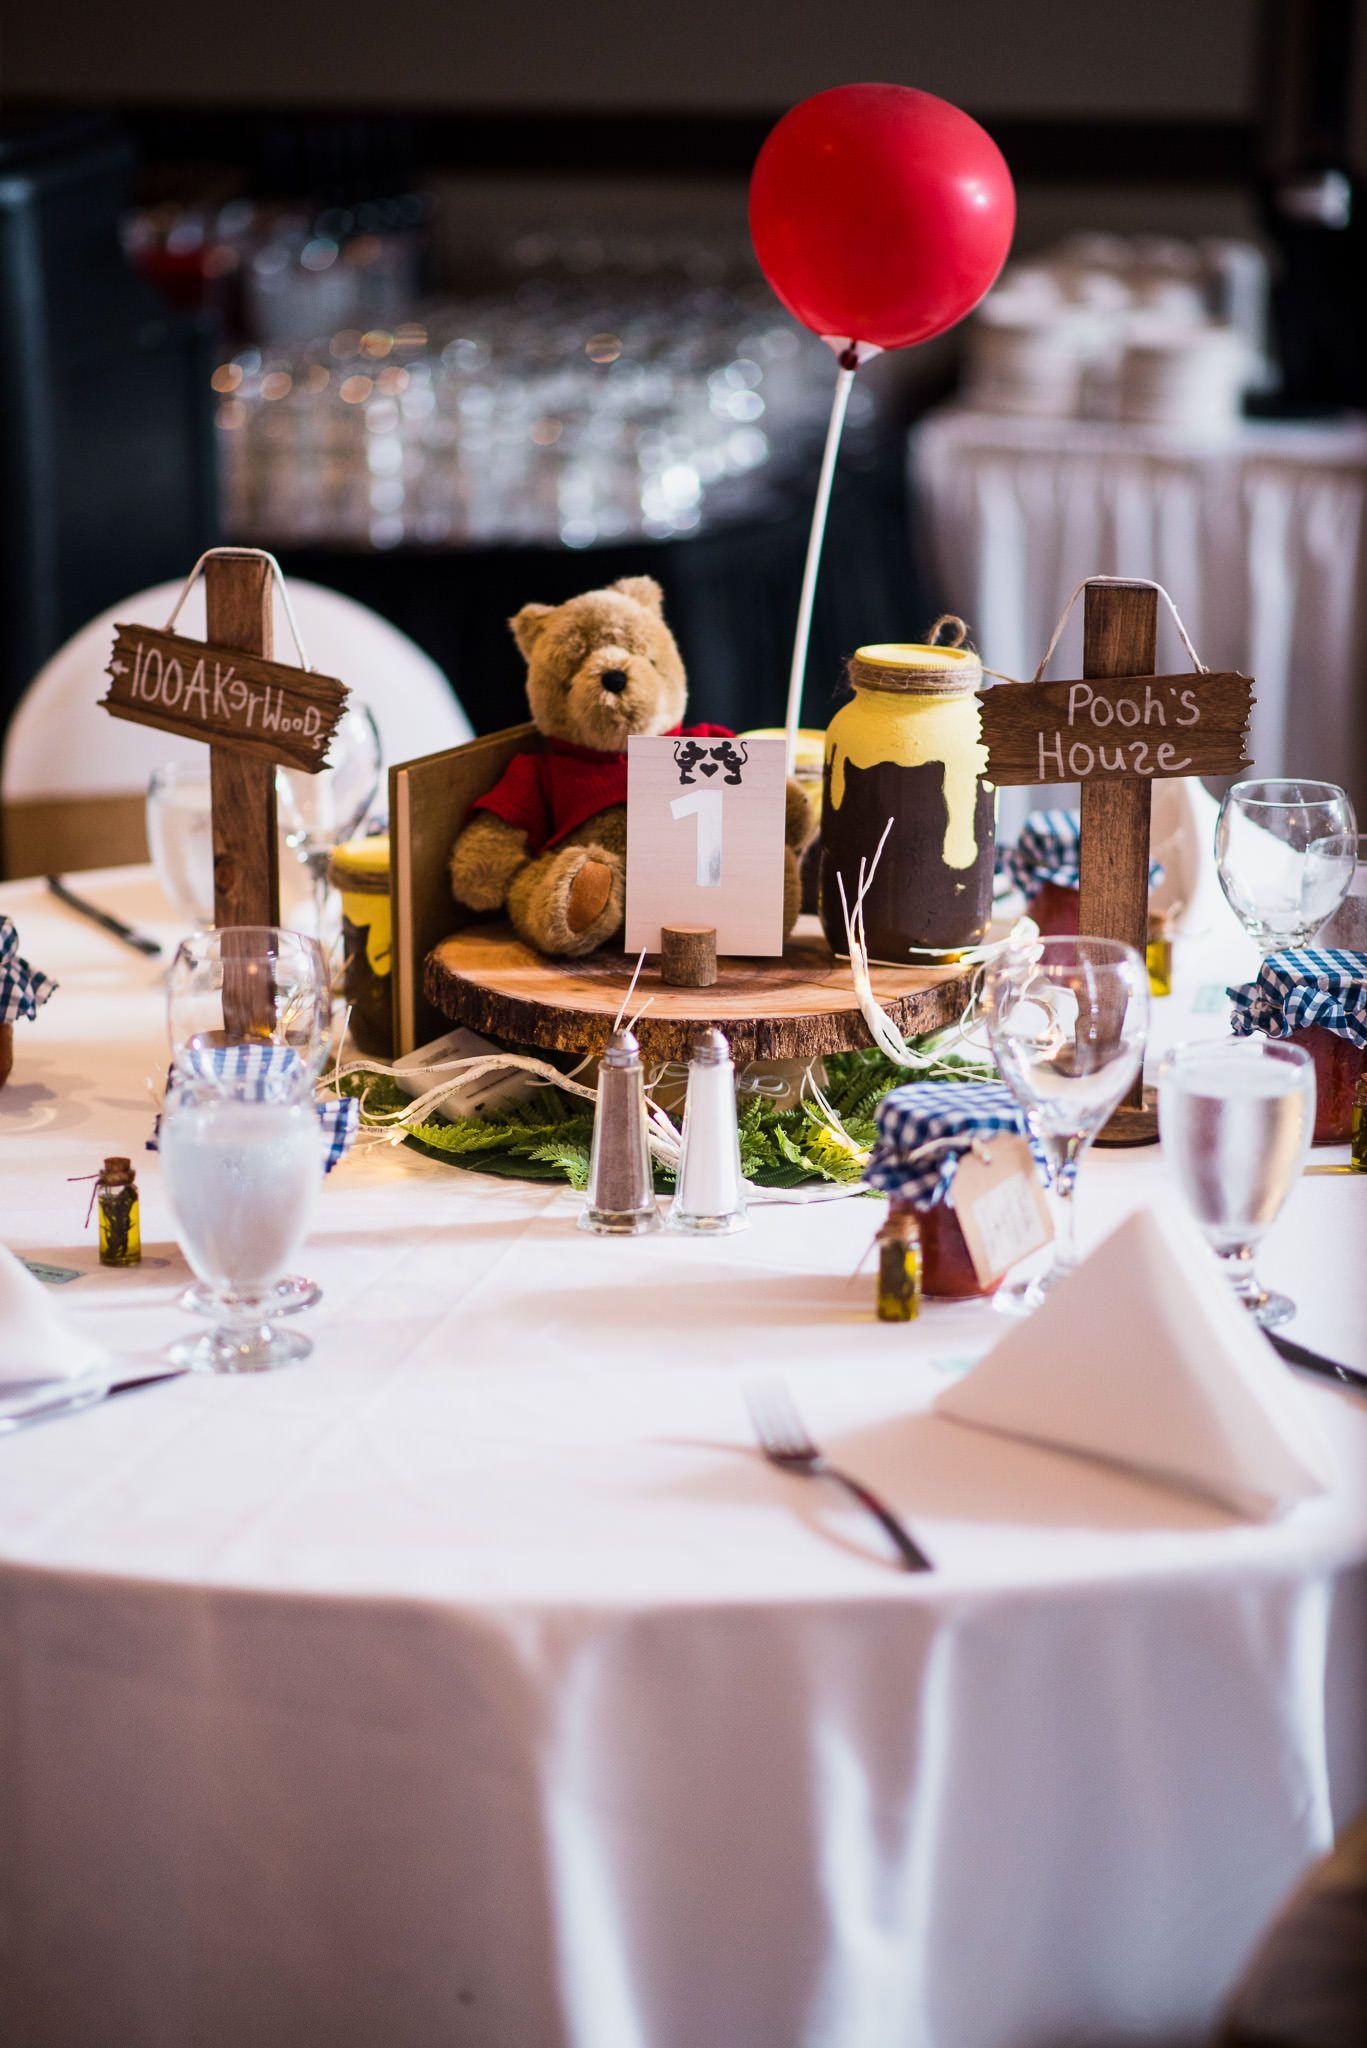 Disney Themed Wedding Table Settings Wedding Table Themes Disney Wedding Theme Disney Wedding Centerpieces